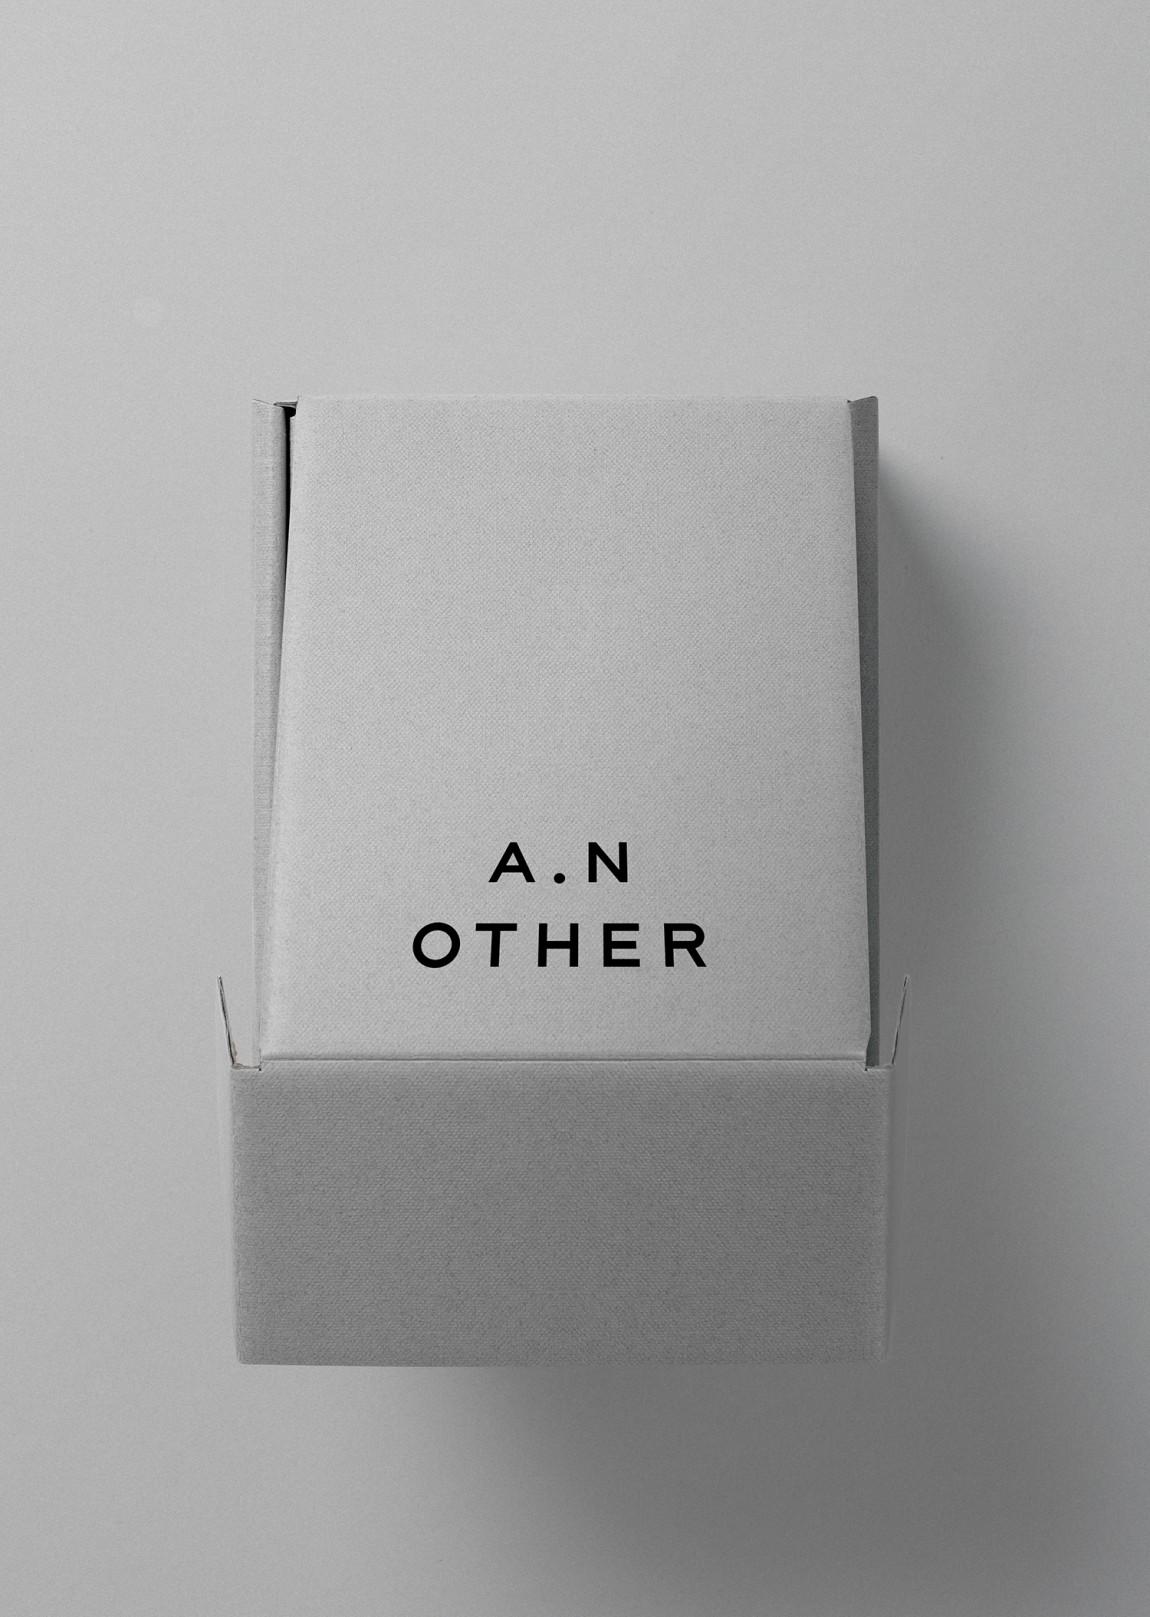 A.N Other品牌策划设计全案,外包装设计